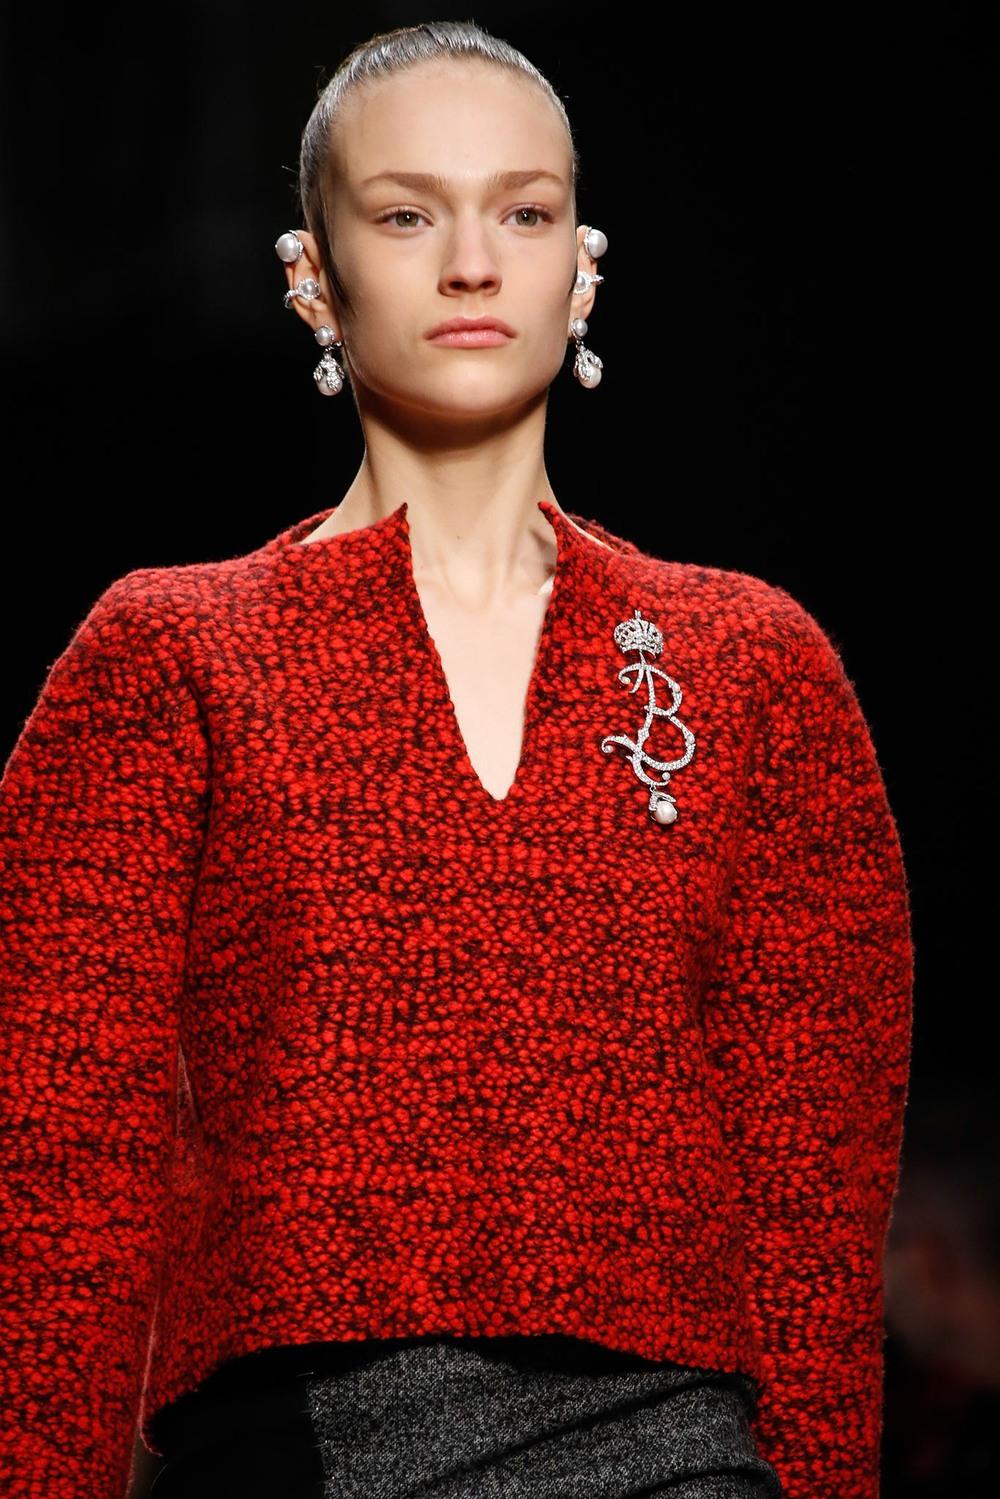 01-02-accessories-trends-fall-2015-estate-jewelry.jpg